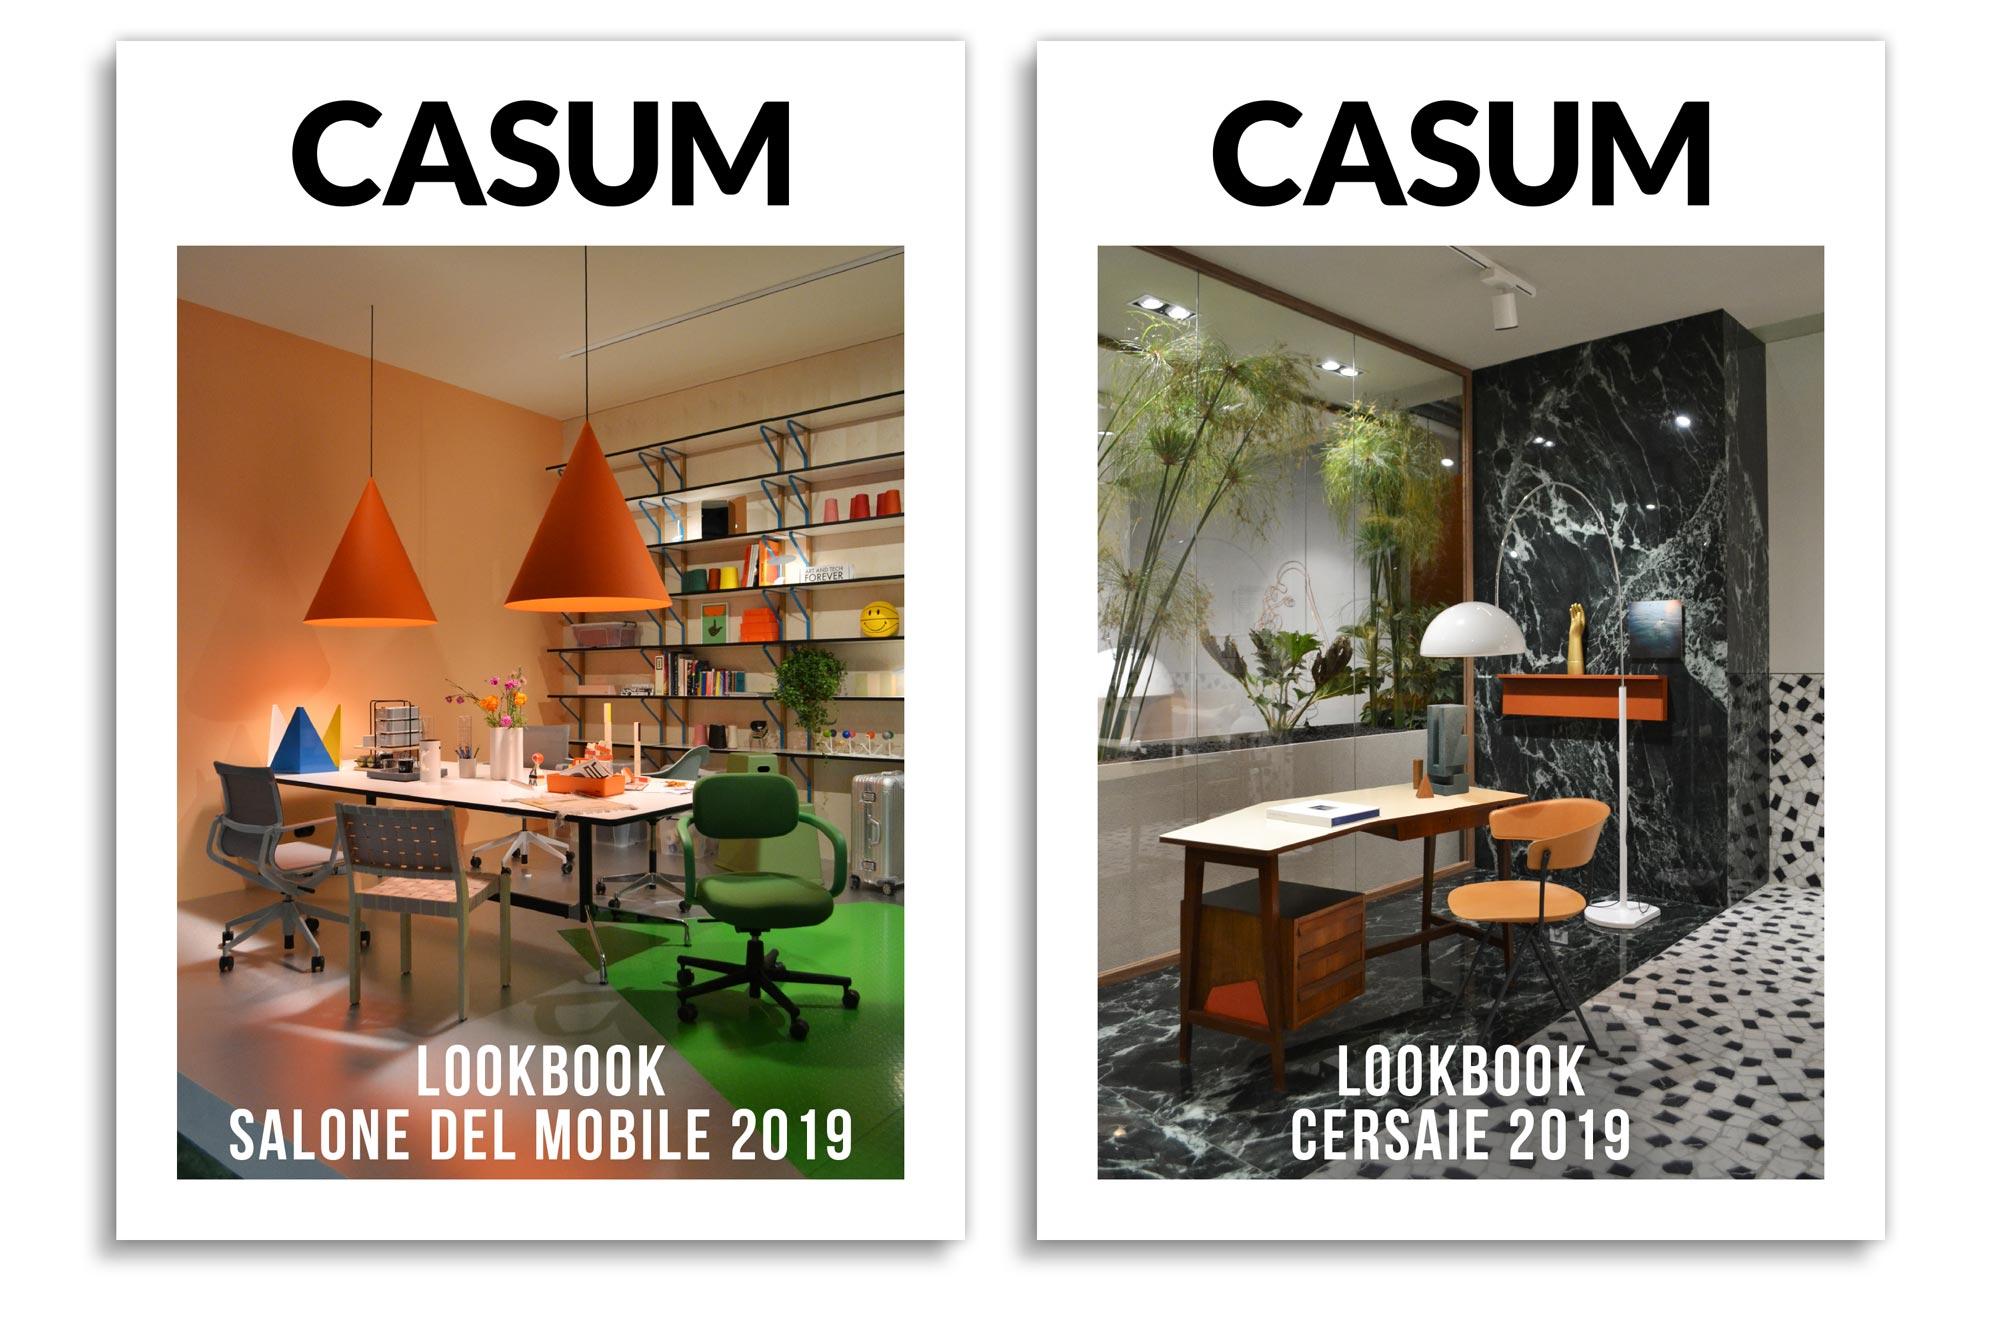 Casum Lookbook Salone del Mobile 2019 and Casum Lookbook Cersaie 2019 covers